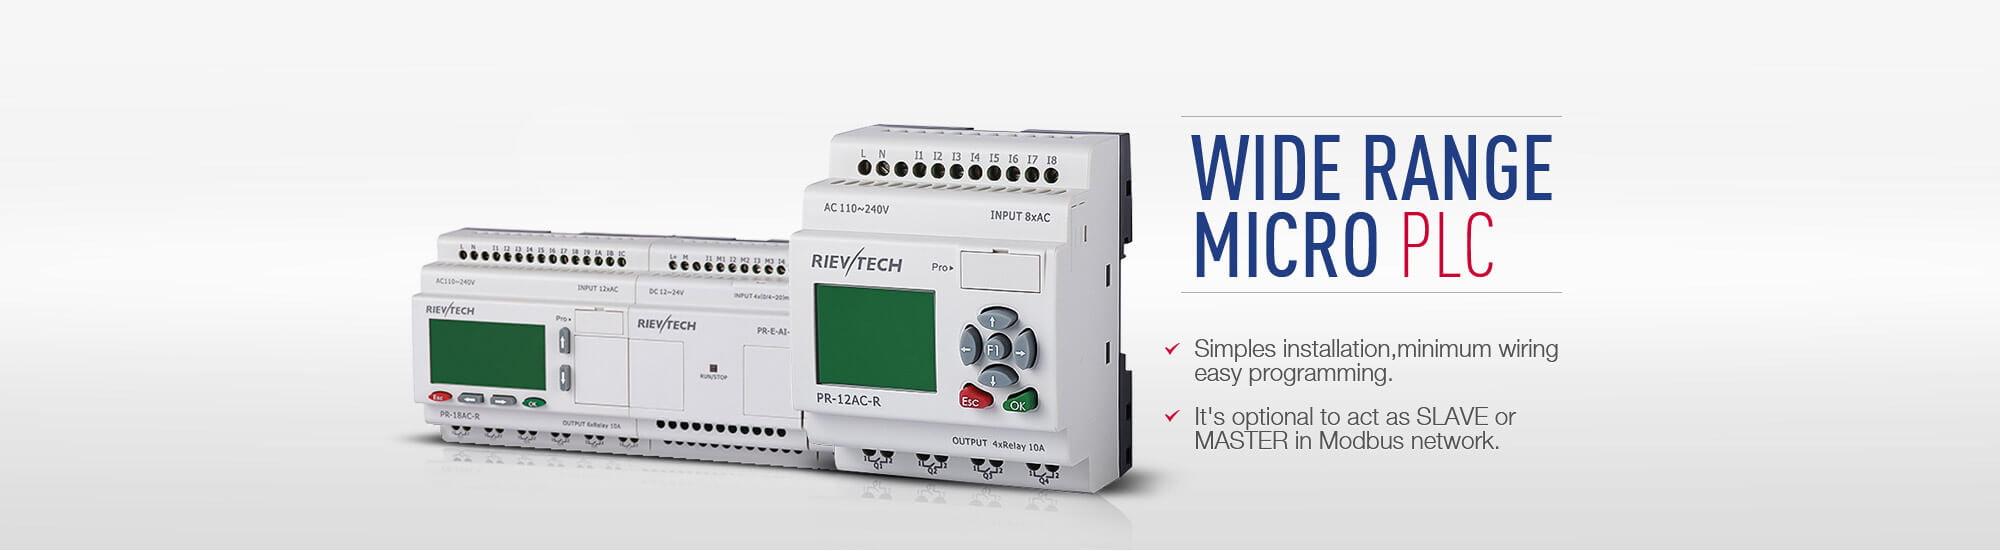 micro-plc